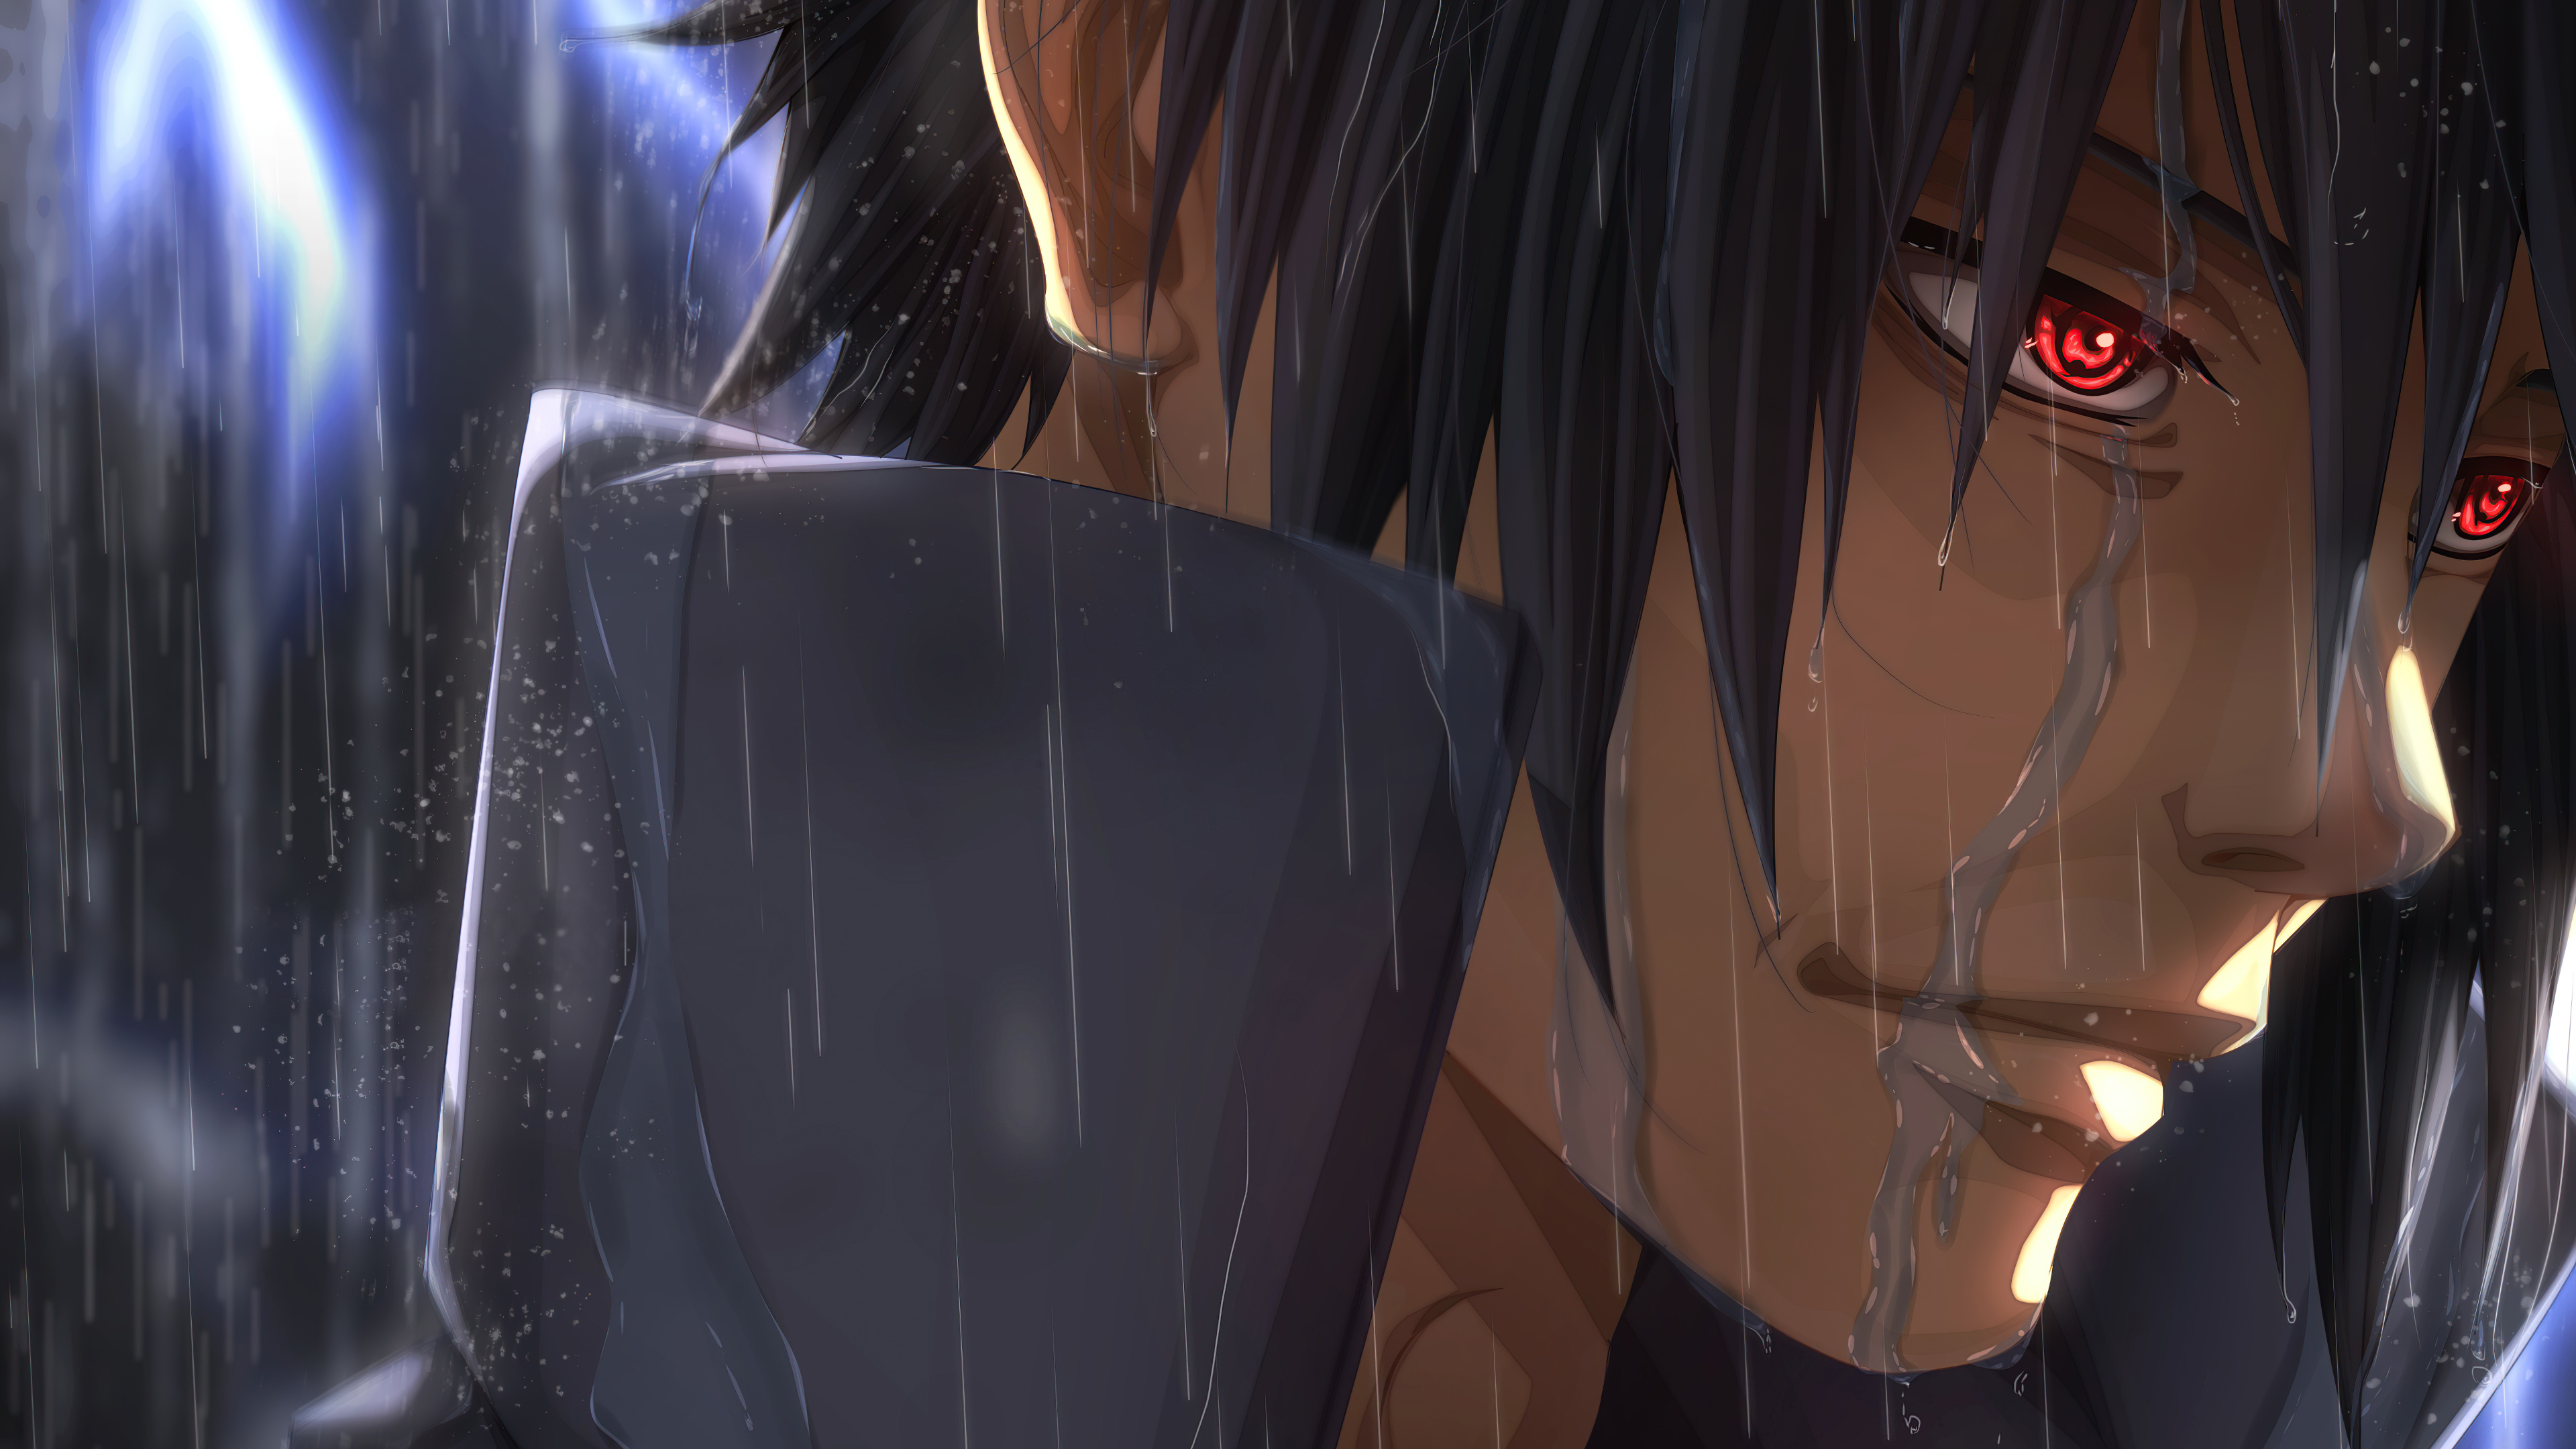 Fondos de pantalla Anime Sasuke Sharingan en la lluvia